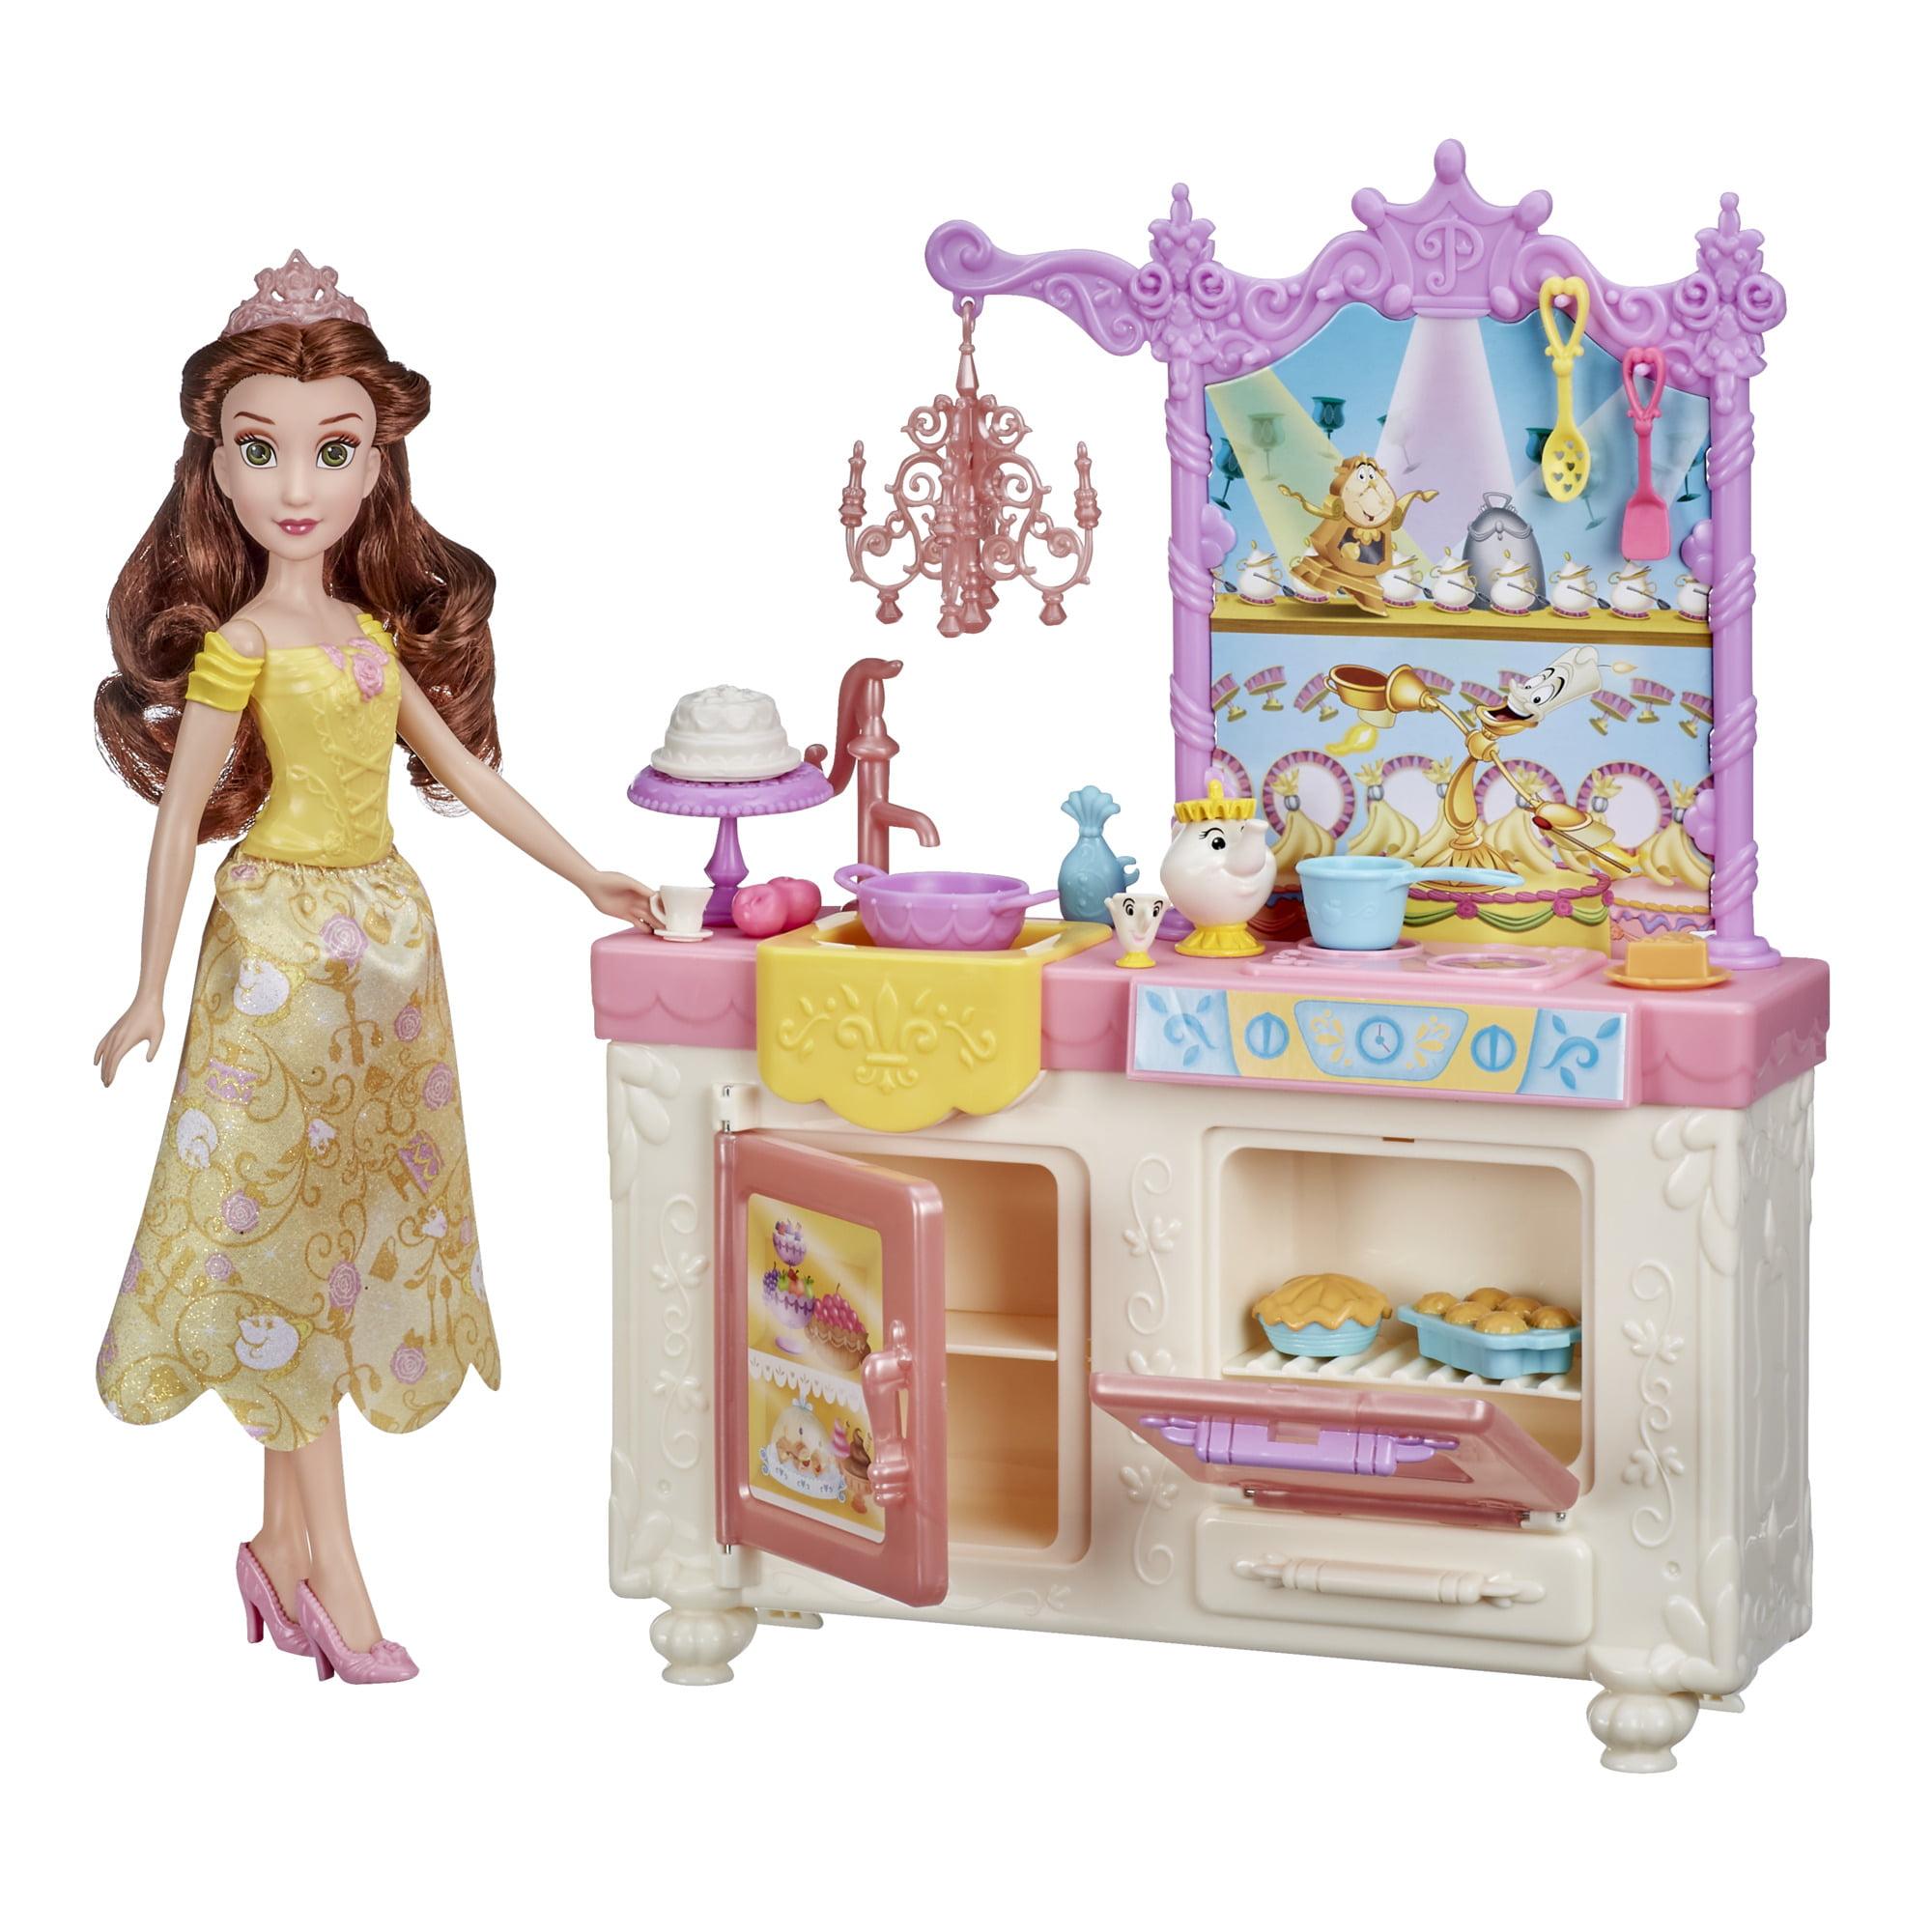 DISNEY PRINCESS 6 x 3D PUZZLE ERASER PLAY SET BELLE ARIEL CINDERELLA GIRL GIFT